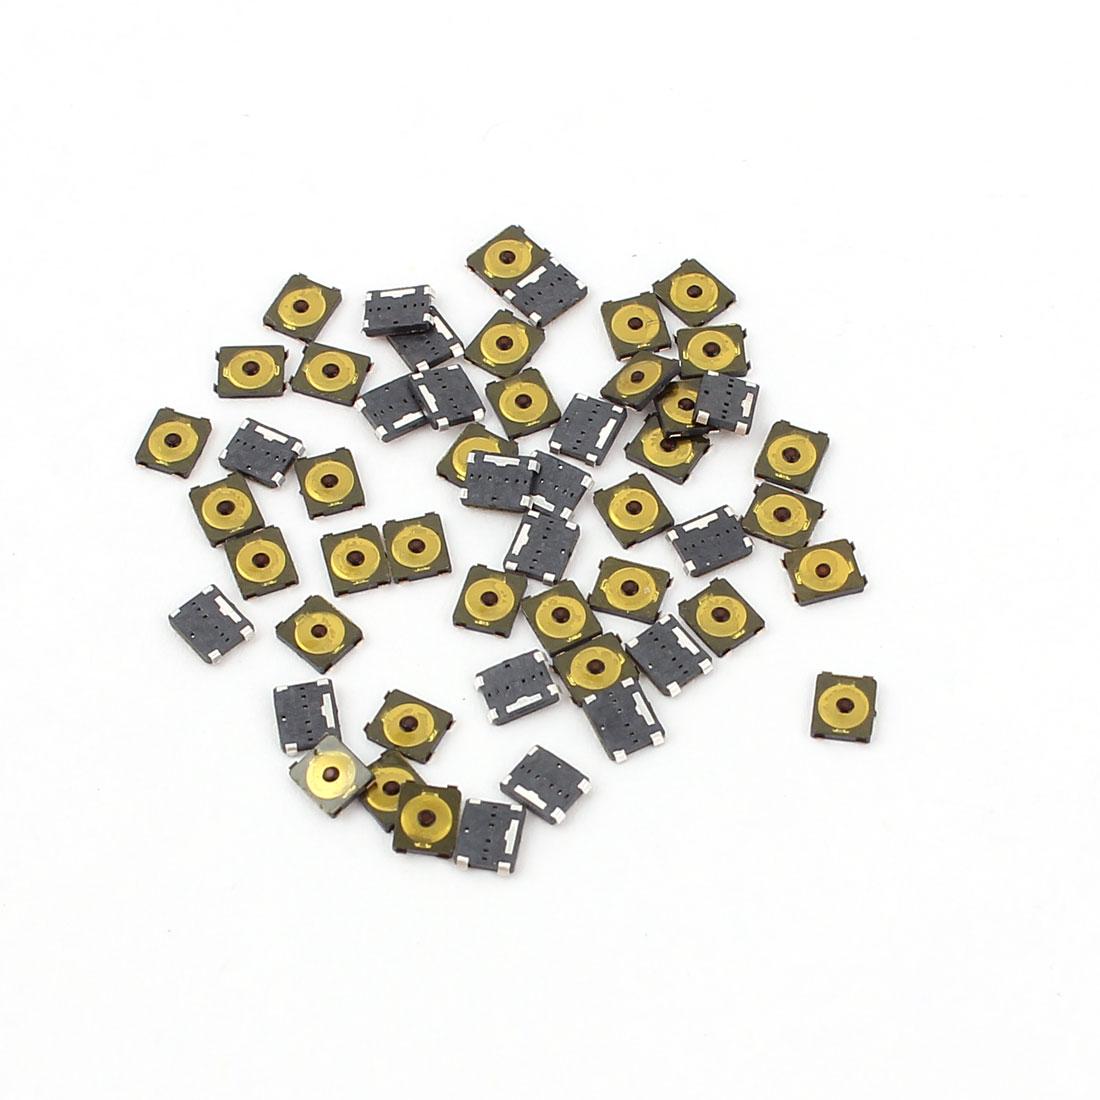 50 Pcs SMD Pushbutton Key Micro Momentary Tact Tactile Switch 3x2.6x0.65mm